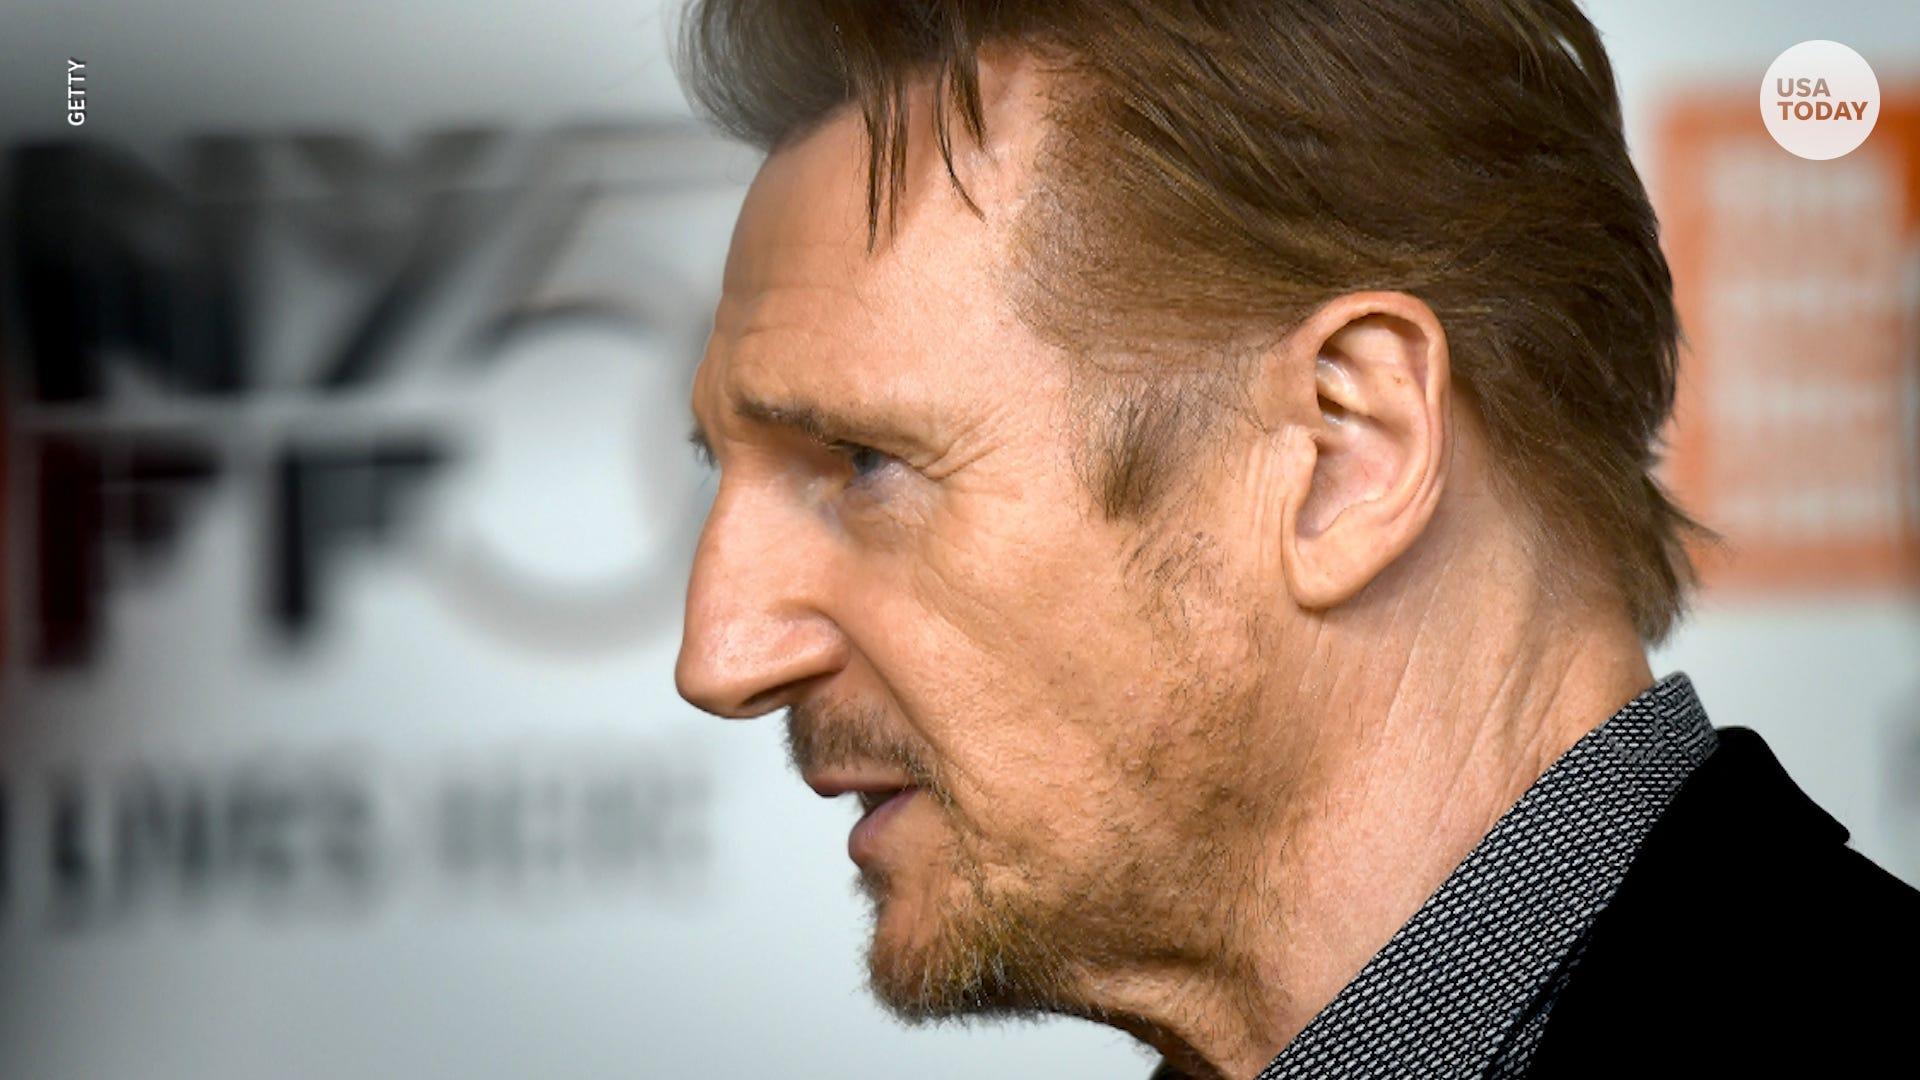 Liam Neeson reveals disturbing racially-charged revenge story